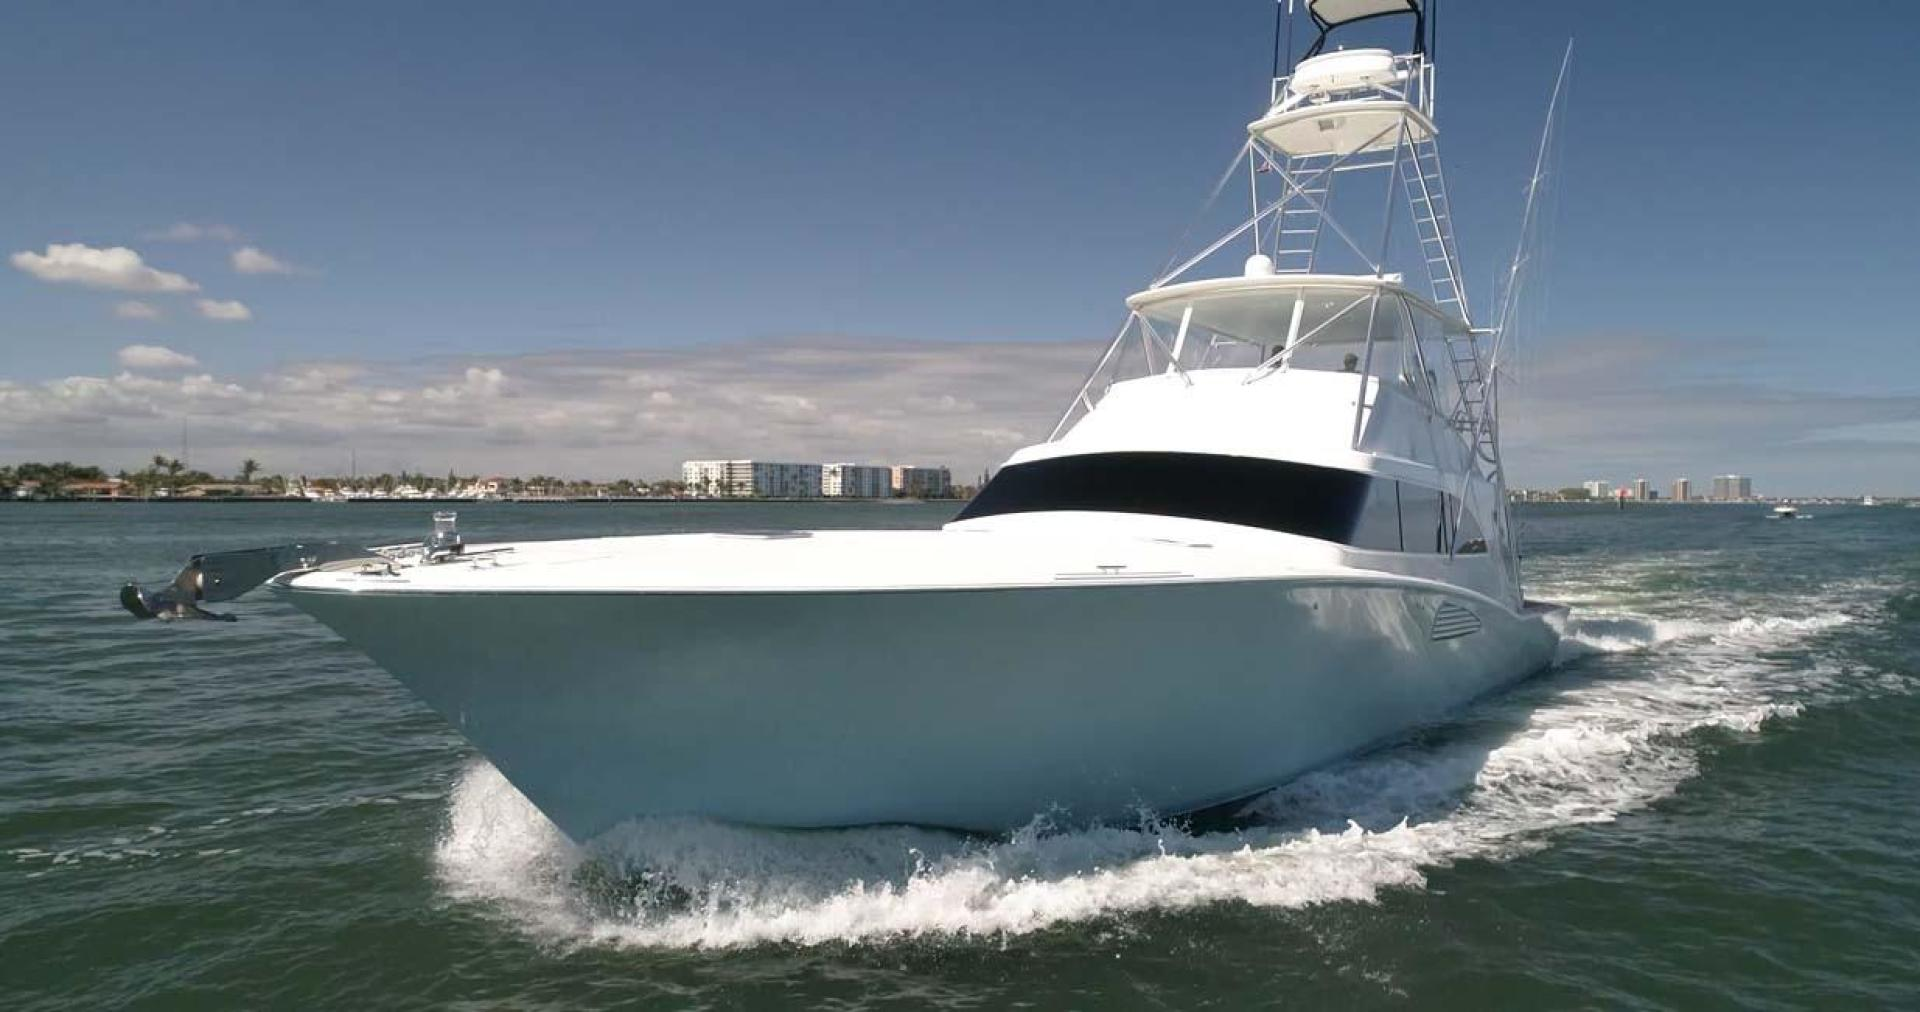 Jim-Smith-Custom-Convertible-Sportfish-2006-Silky-Palm-Beach-Florida-United-States-2006-Jim-Smith-Custom-Convertible-68-924598